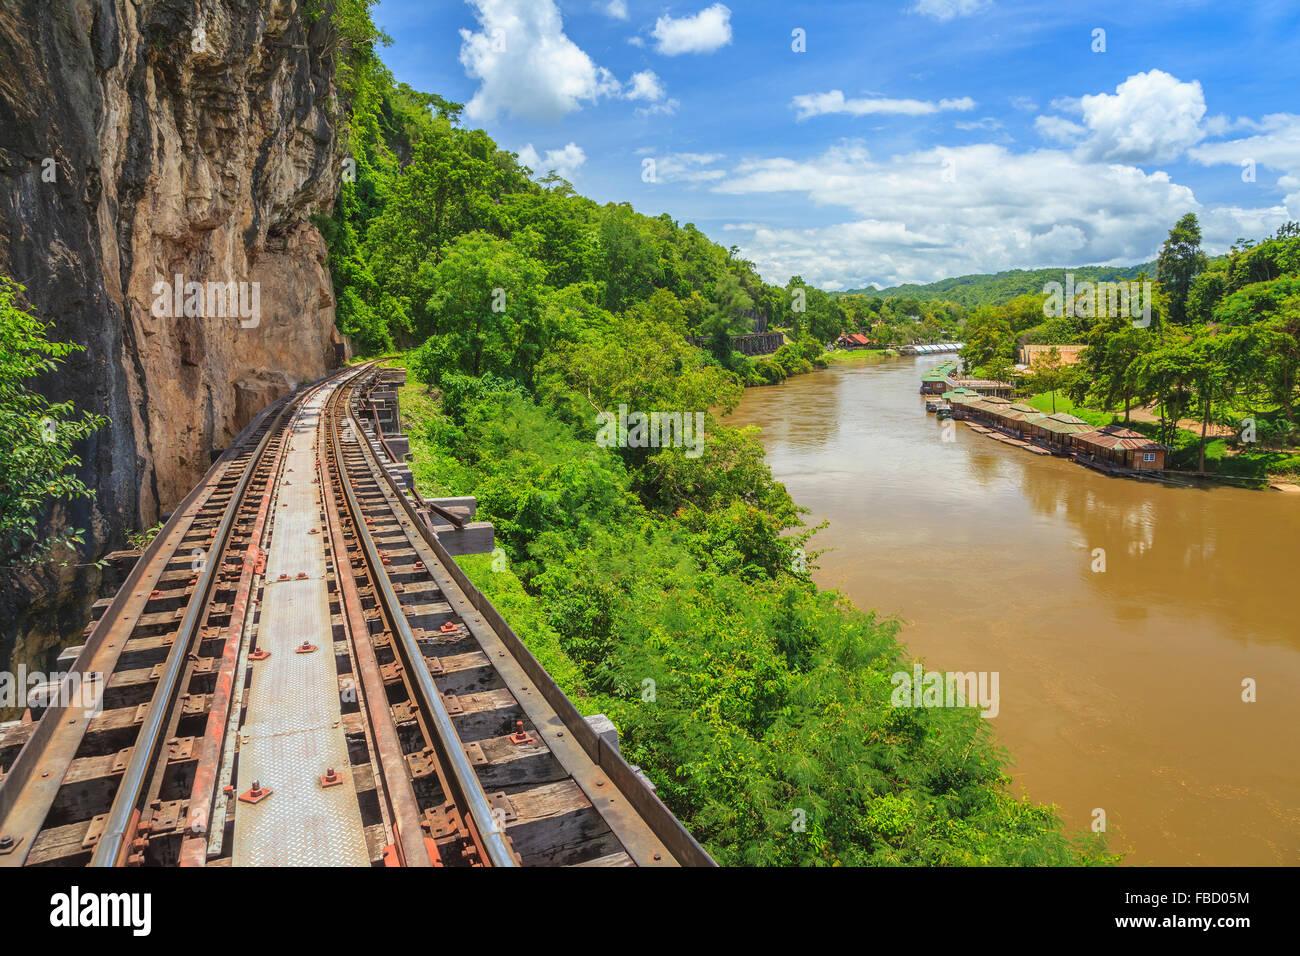 Railwat via e il fiume Kwai a Kanchanaburi Immagini Stock